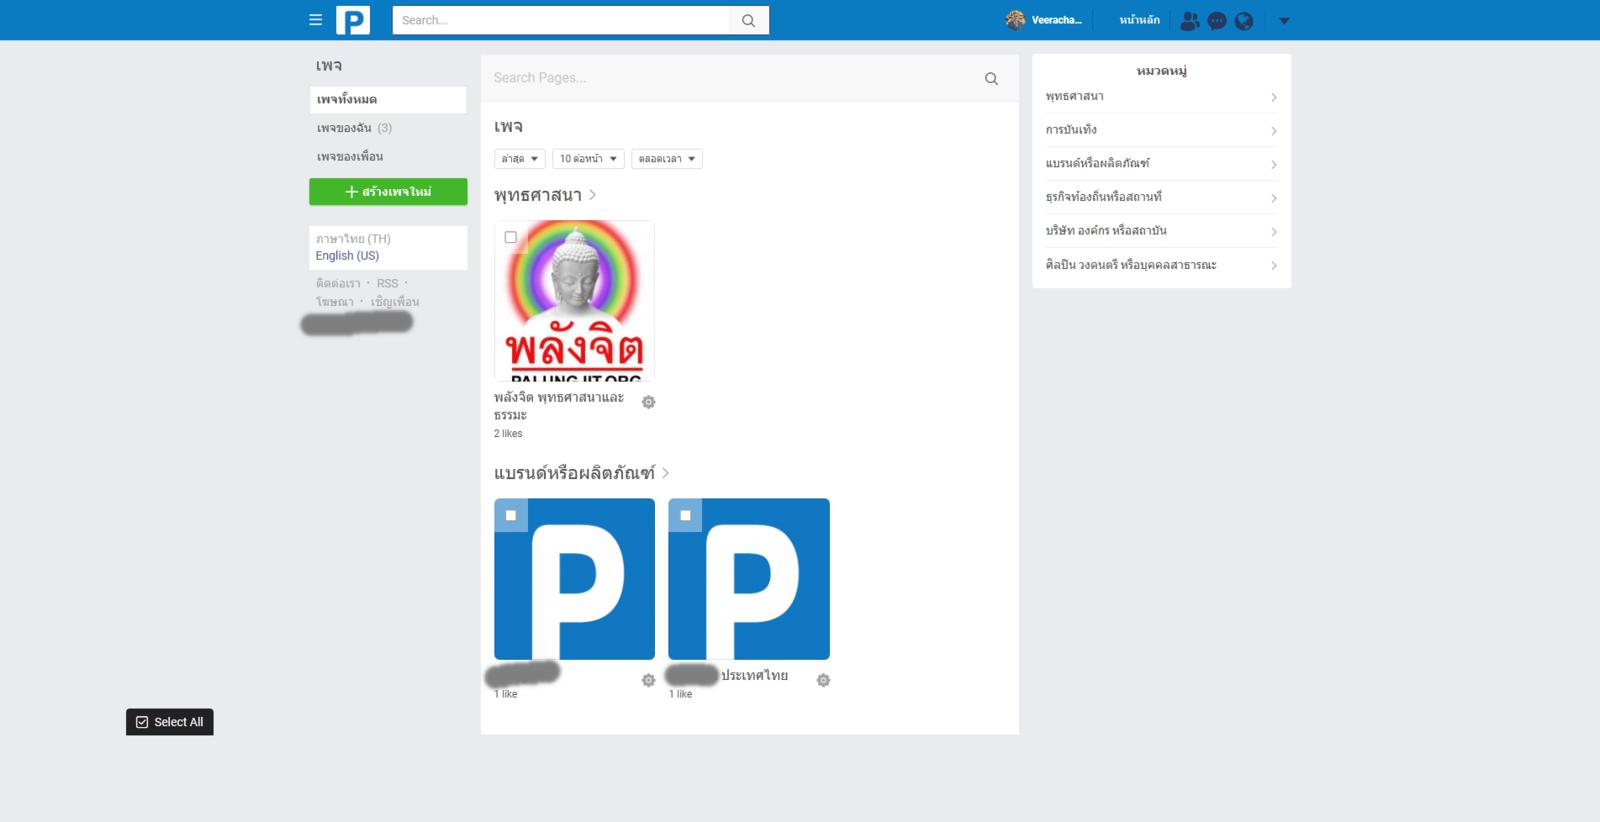 Screenshot_2018-12-25 การตั้งค่าความเป็นส่วนตัว.png